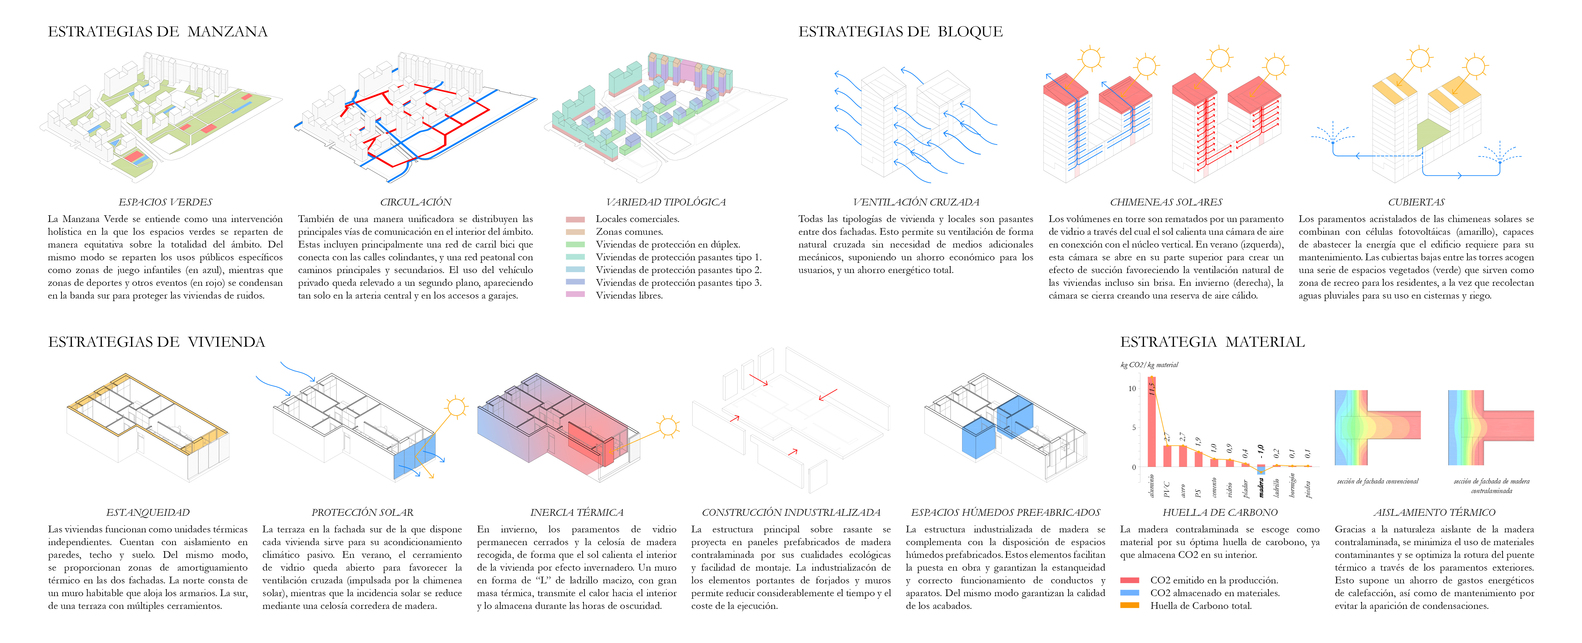 Gallery Of Práctica And Daroca Arquitectos Mixed Housing